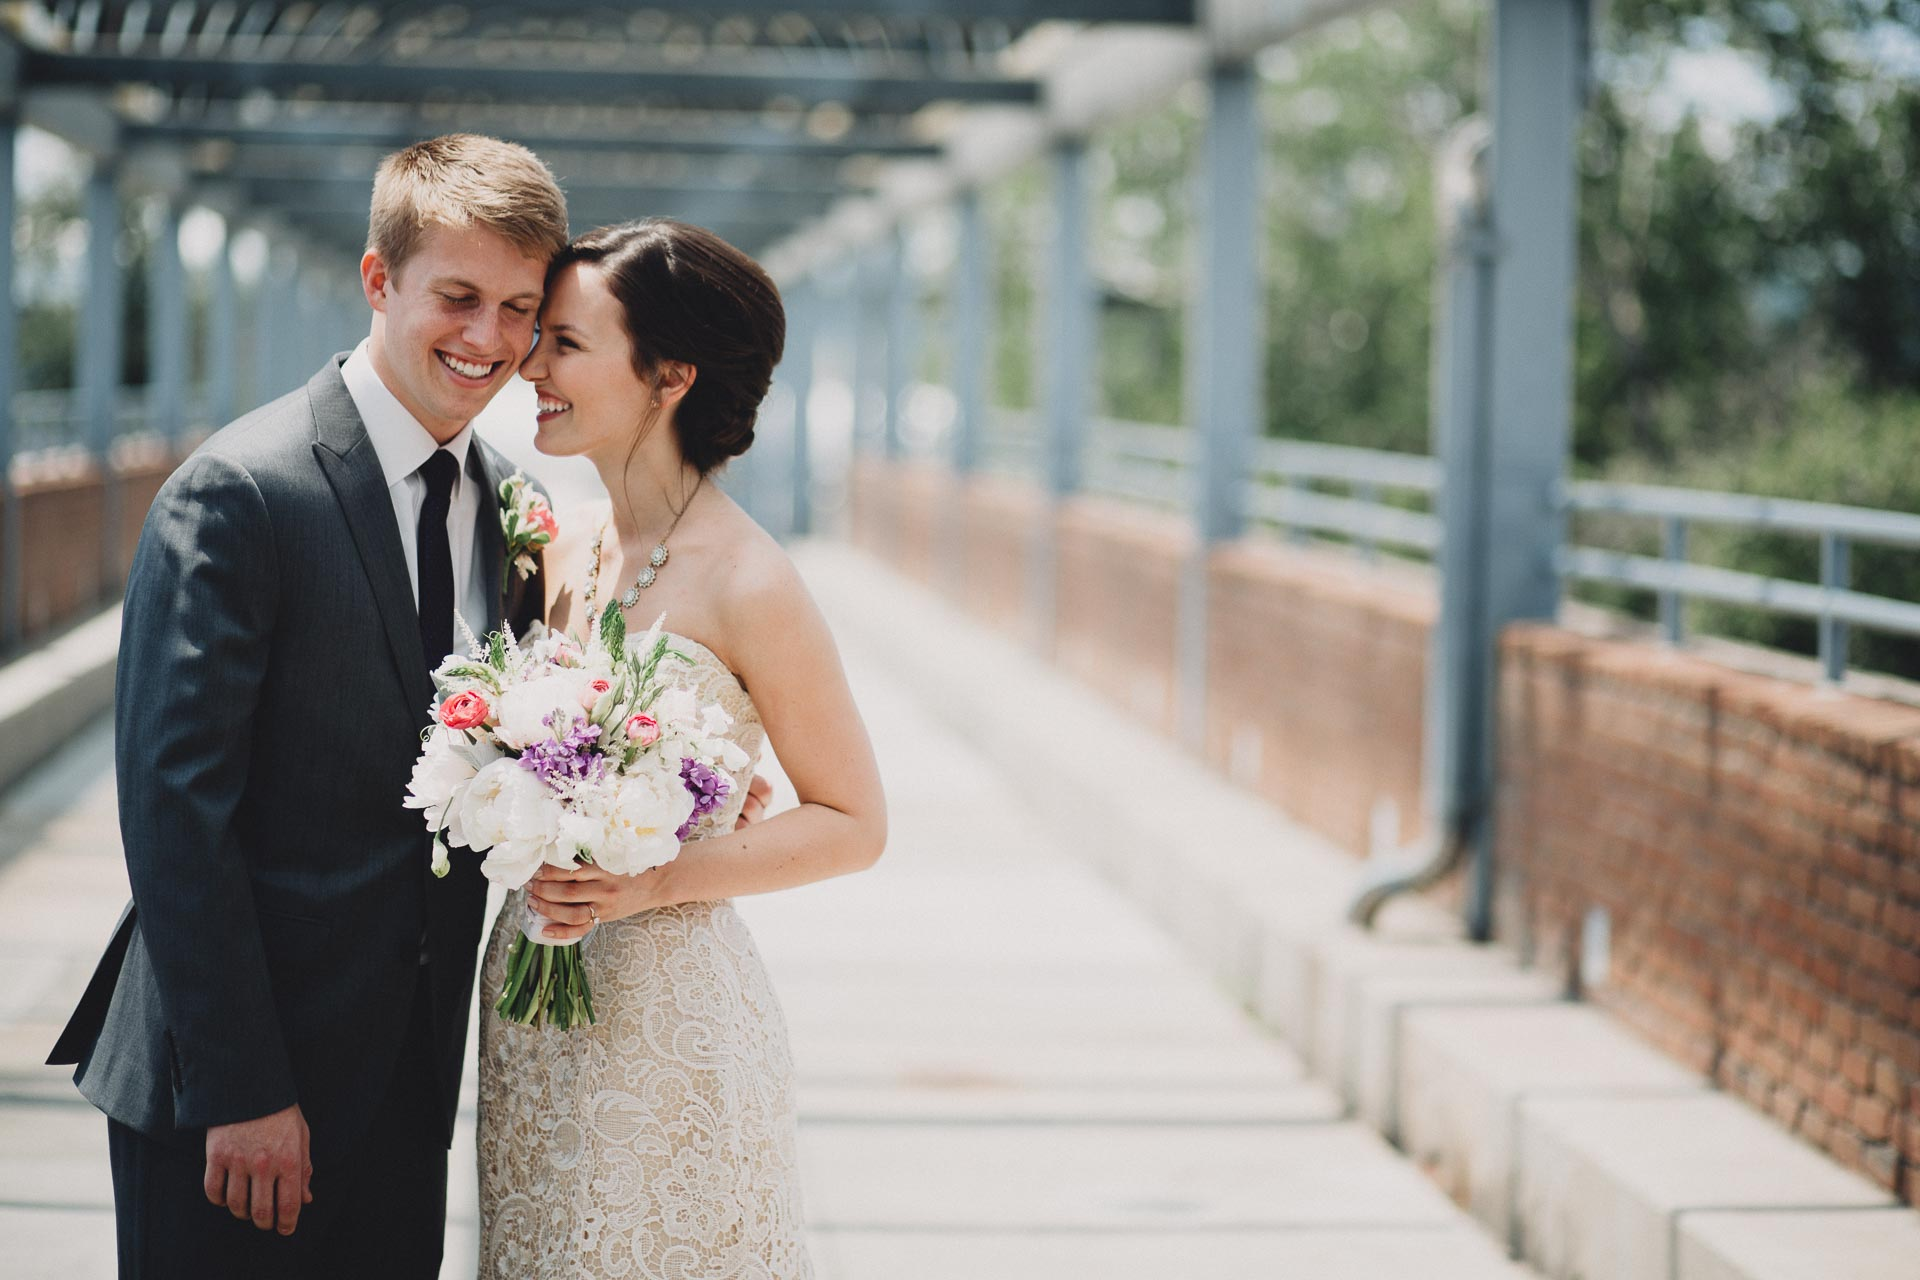 Julia-Michael-Cincinnati-Music-Hall-Wedding-057@2x.jpg